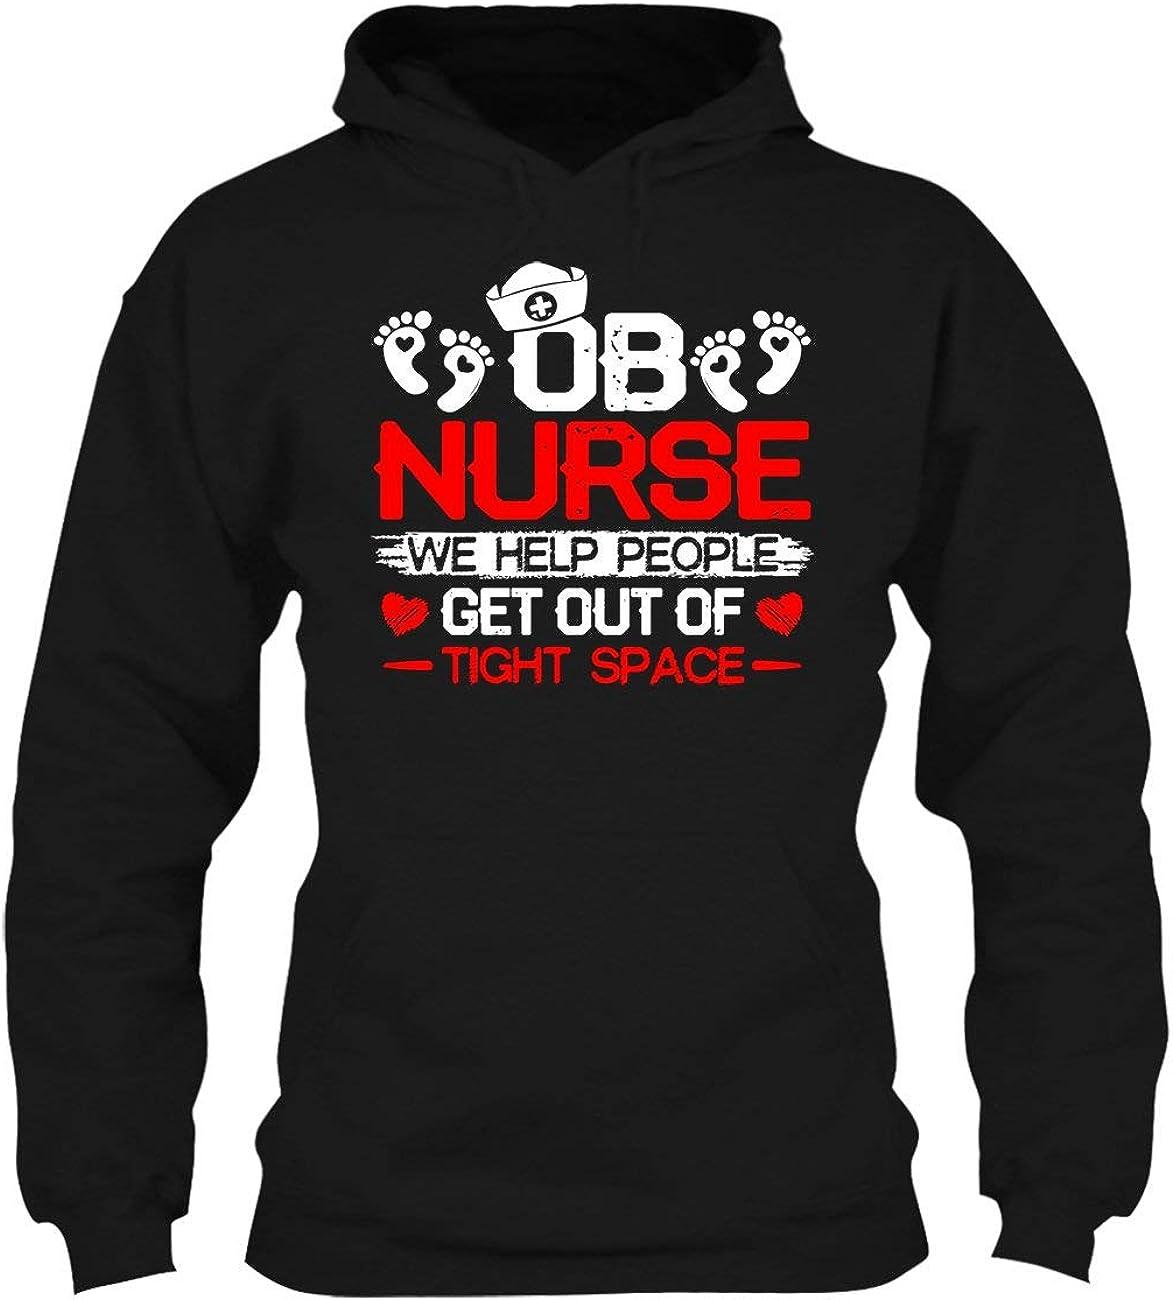 Proud OB Bargain Nurse Dallas Mall Tee Sleeve Long Cool Shirt